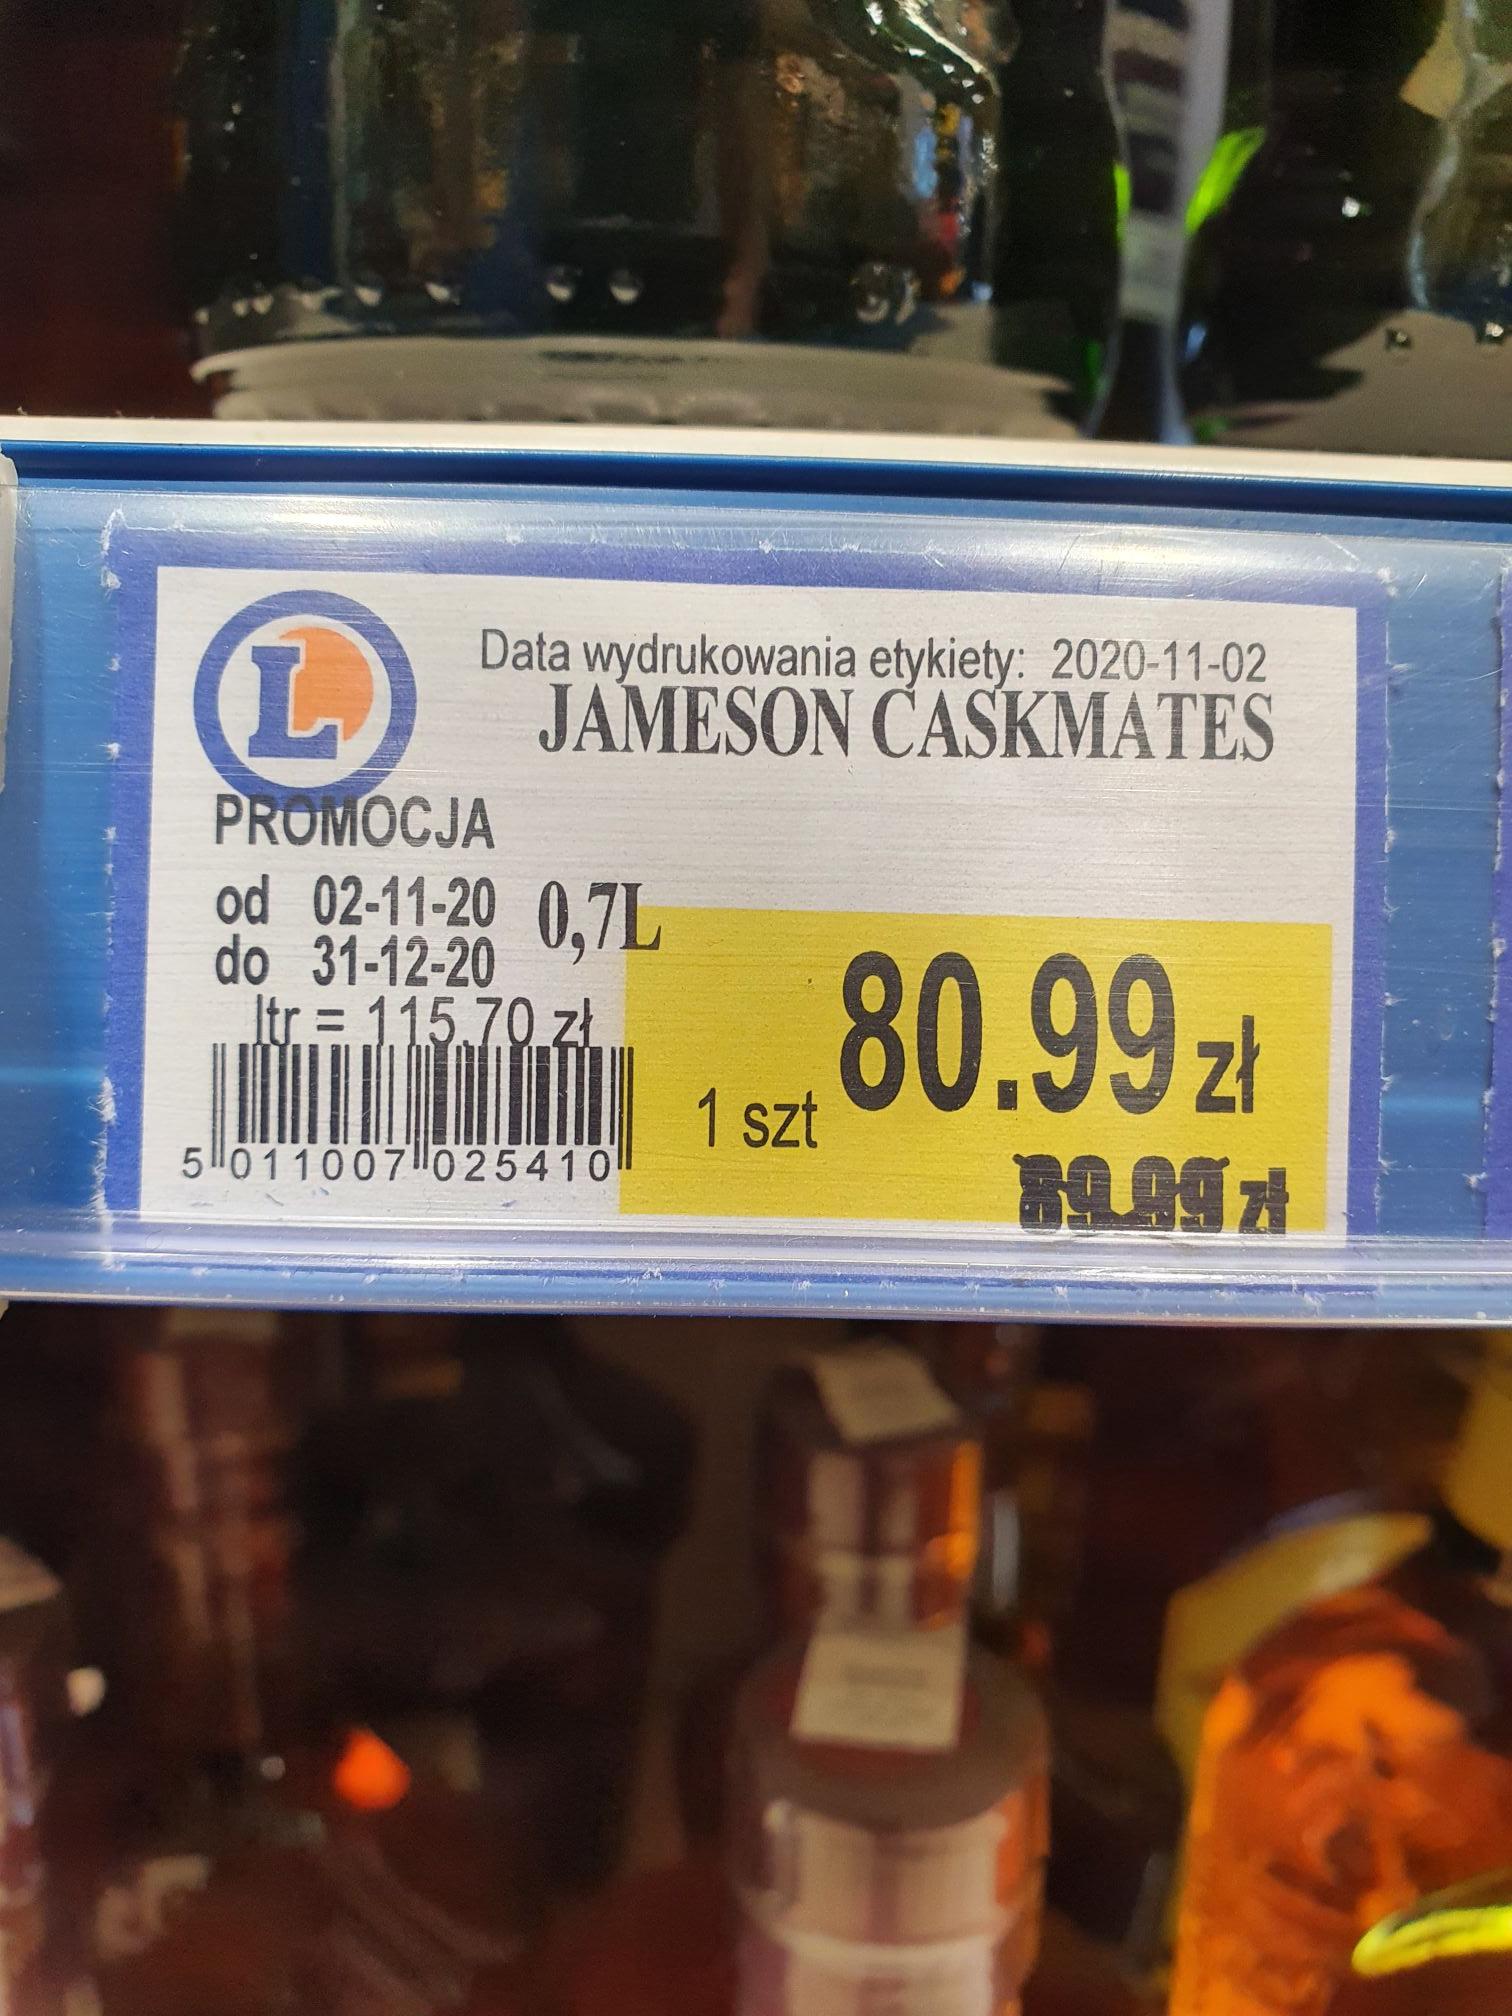 Jameson Caskmates